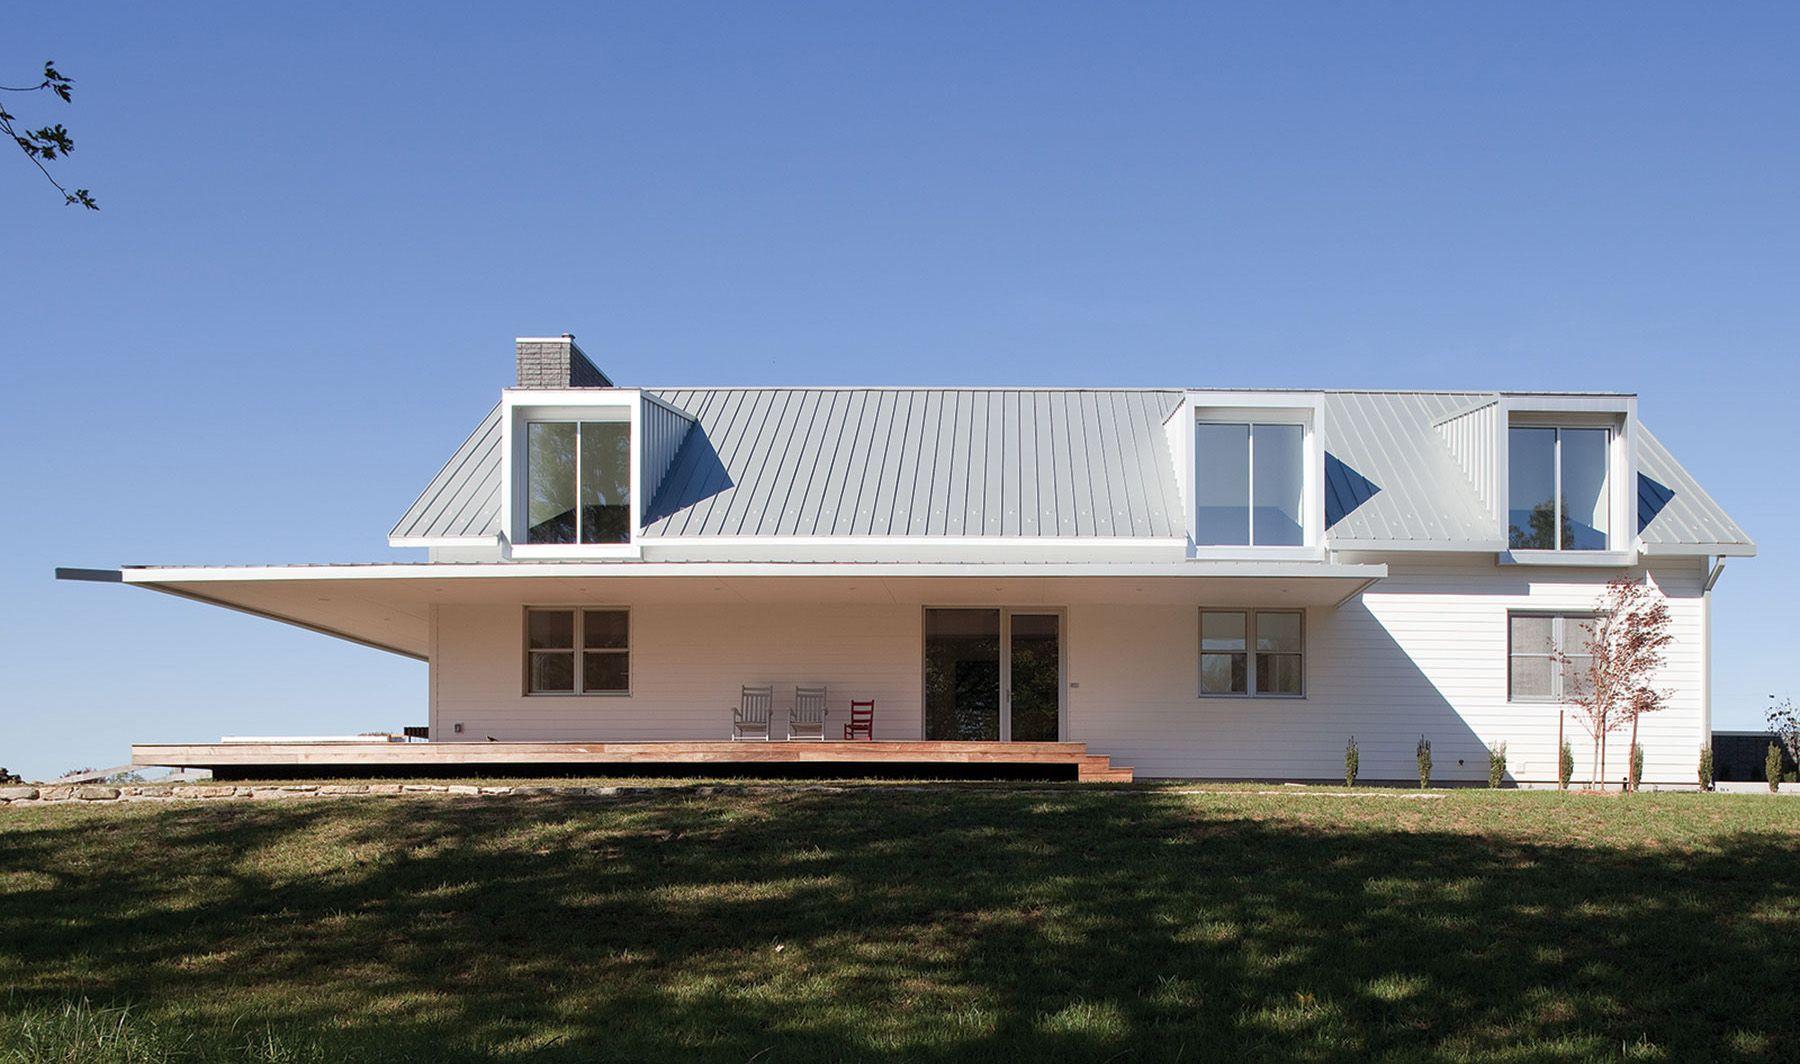 A Modern Take On Traditional Farmhouse Design